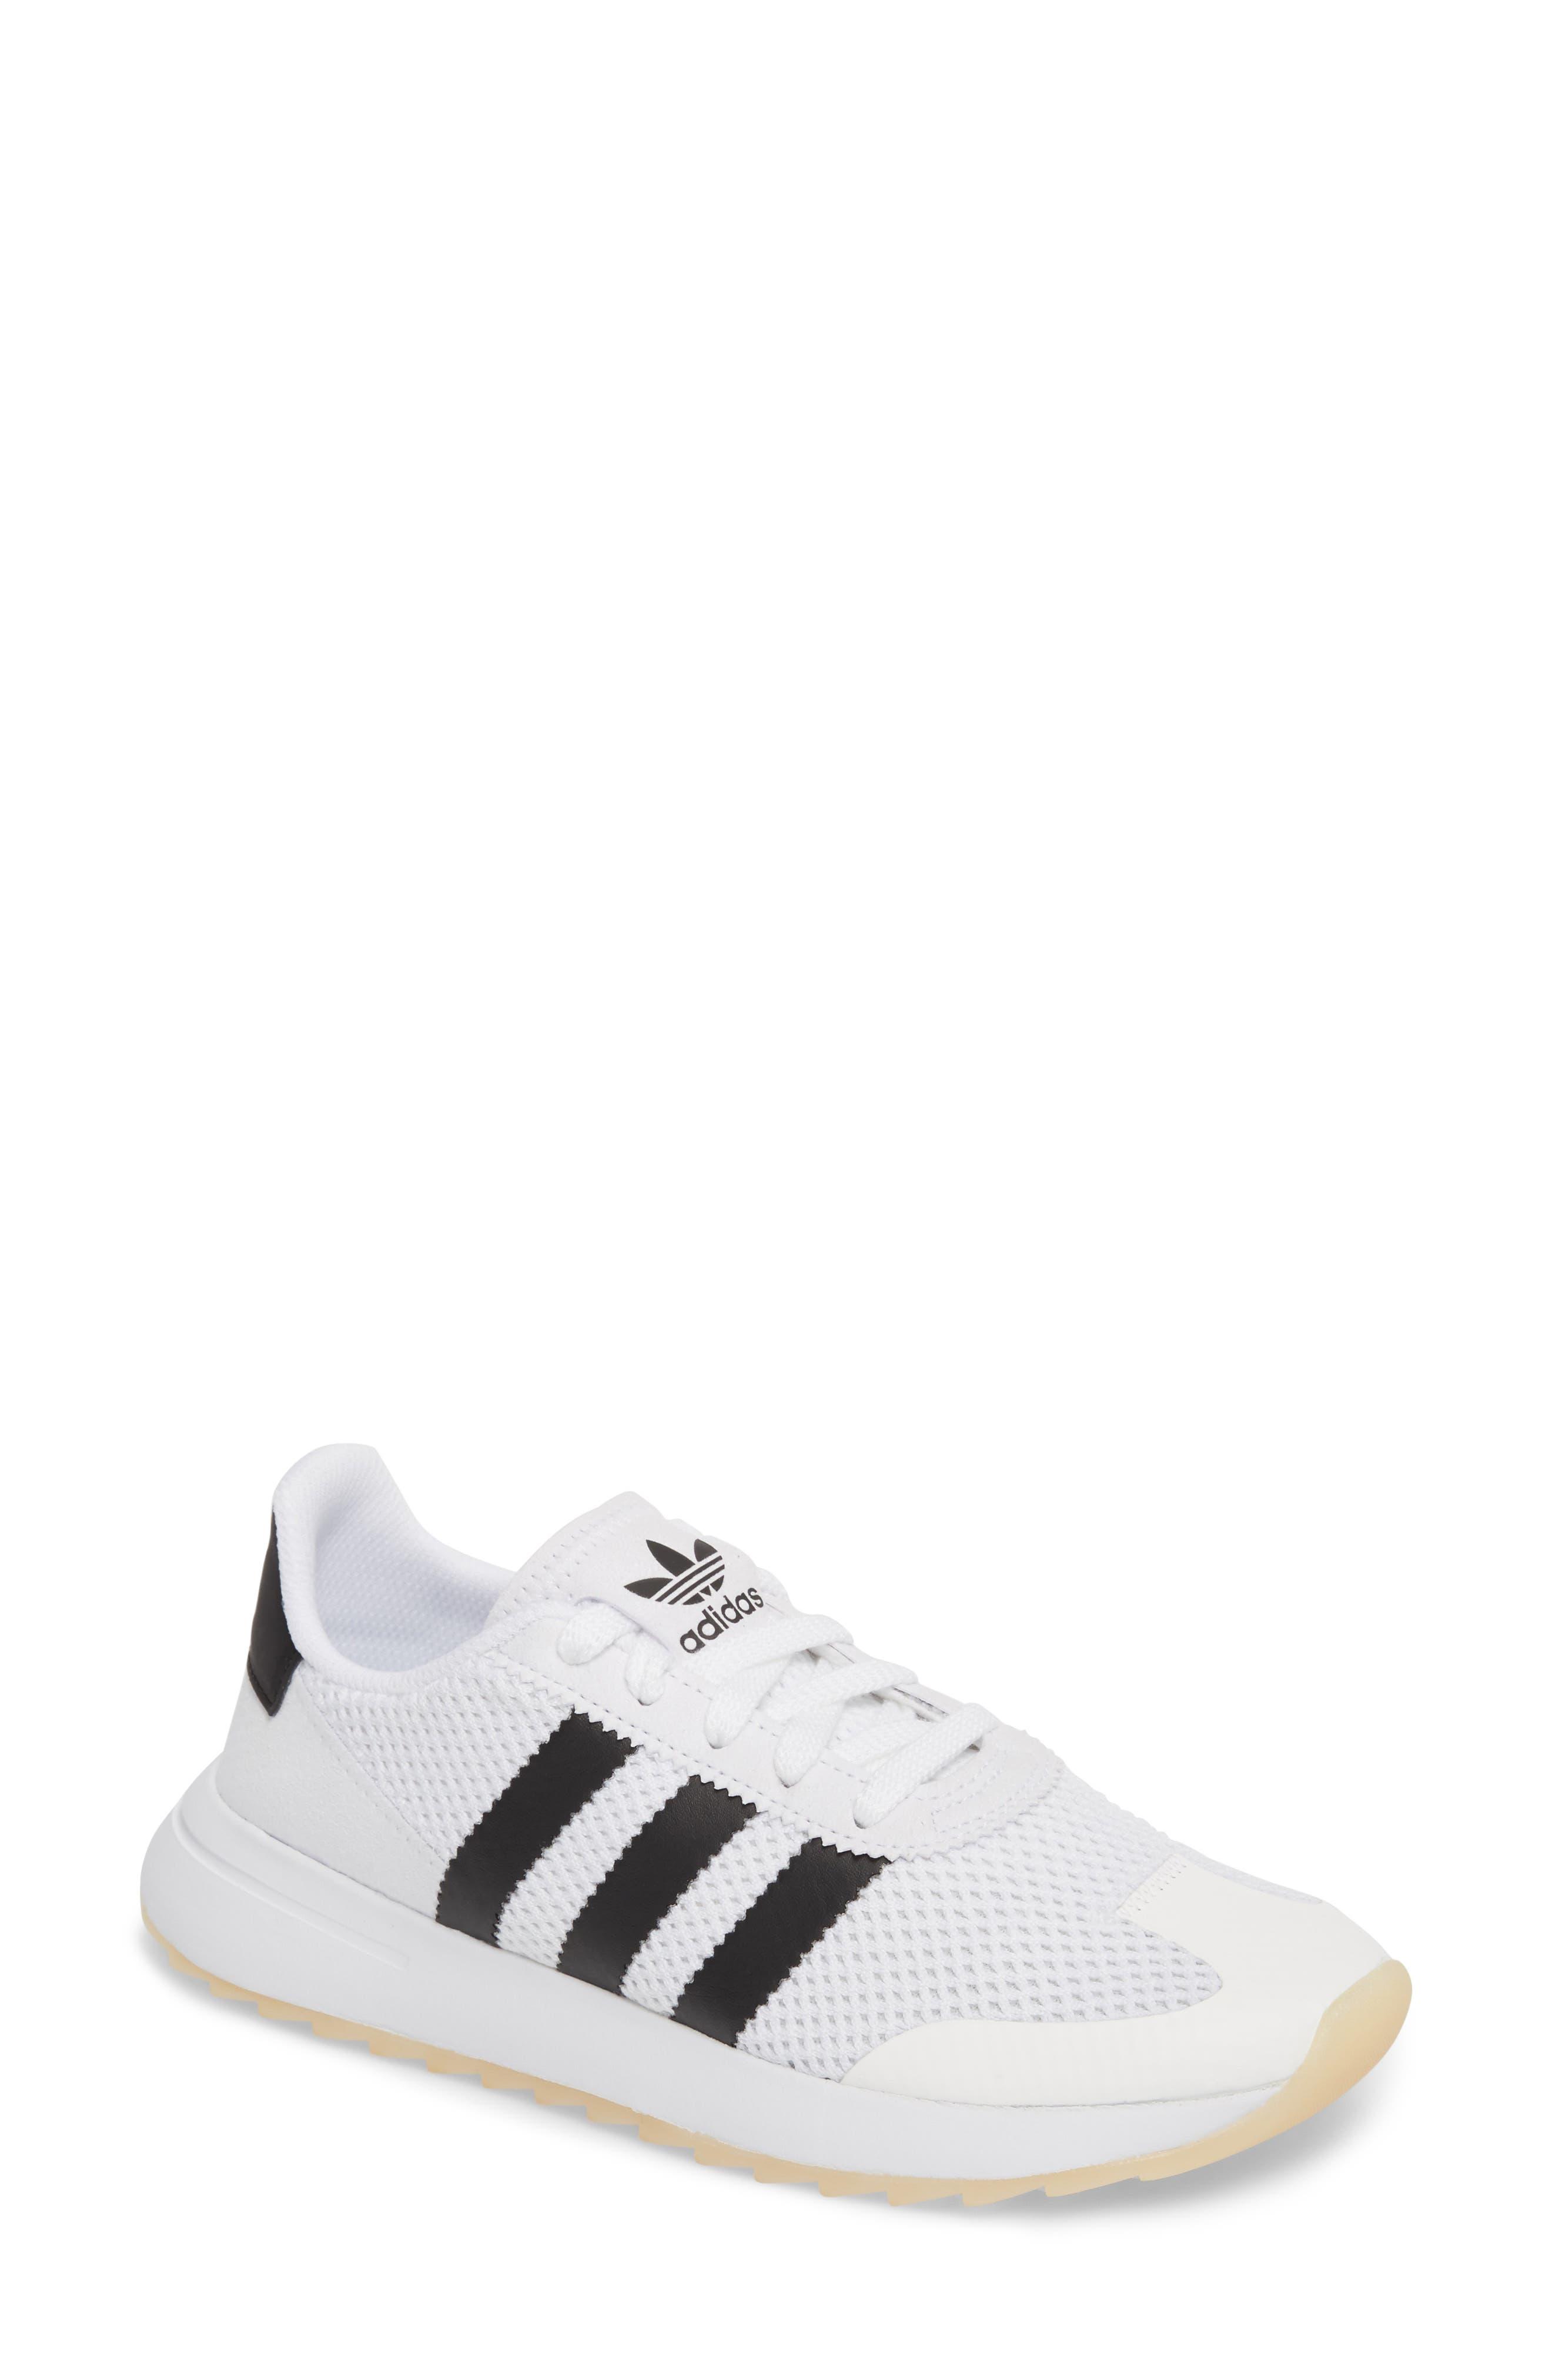 Flashback Sneaker,                             Main thumbnail 1, color,